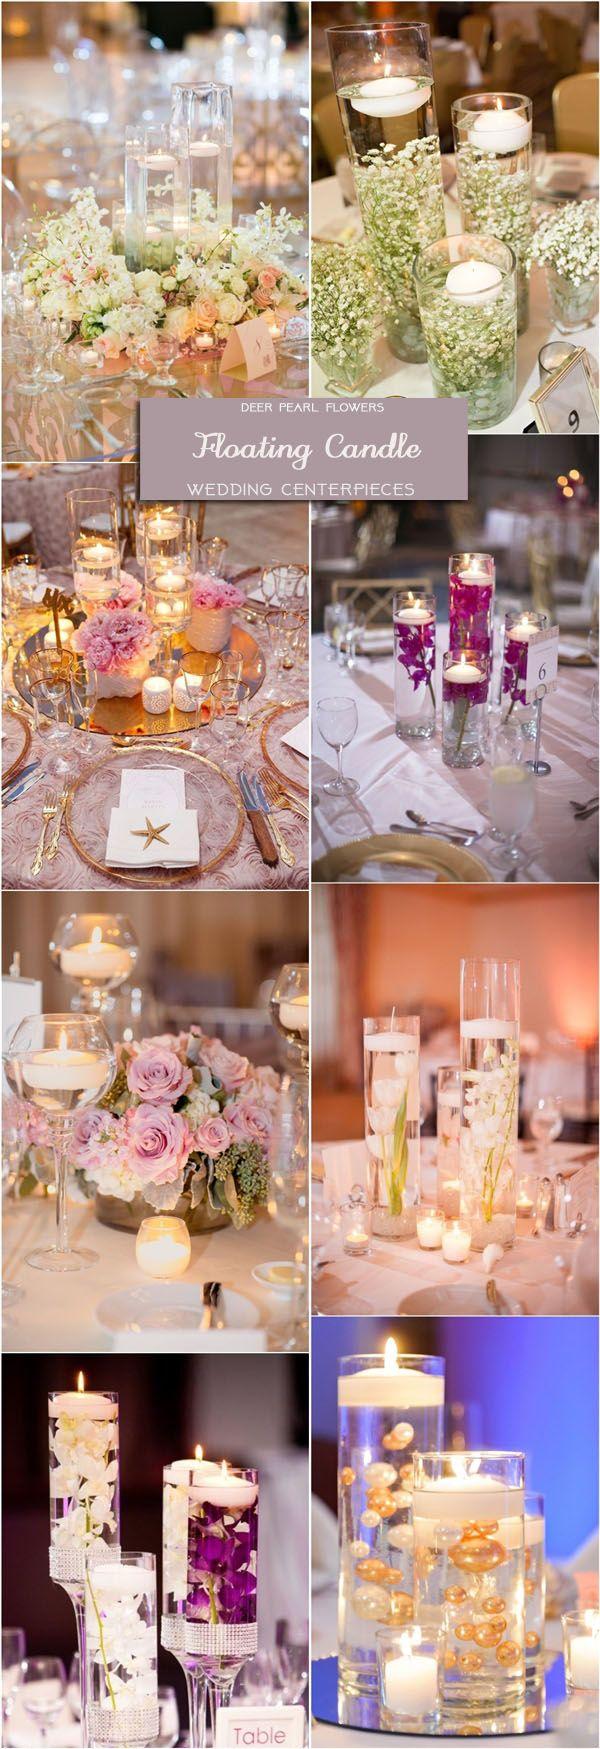 Floating Candle Wedding Centerpieces / http://www.deerpearlflowers.com/wedding-centerpiece-ideas/